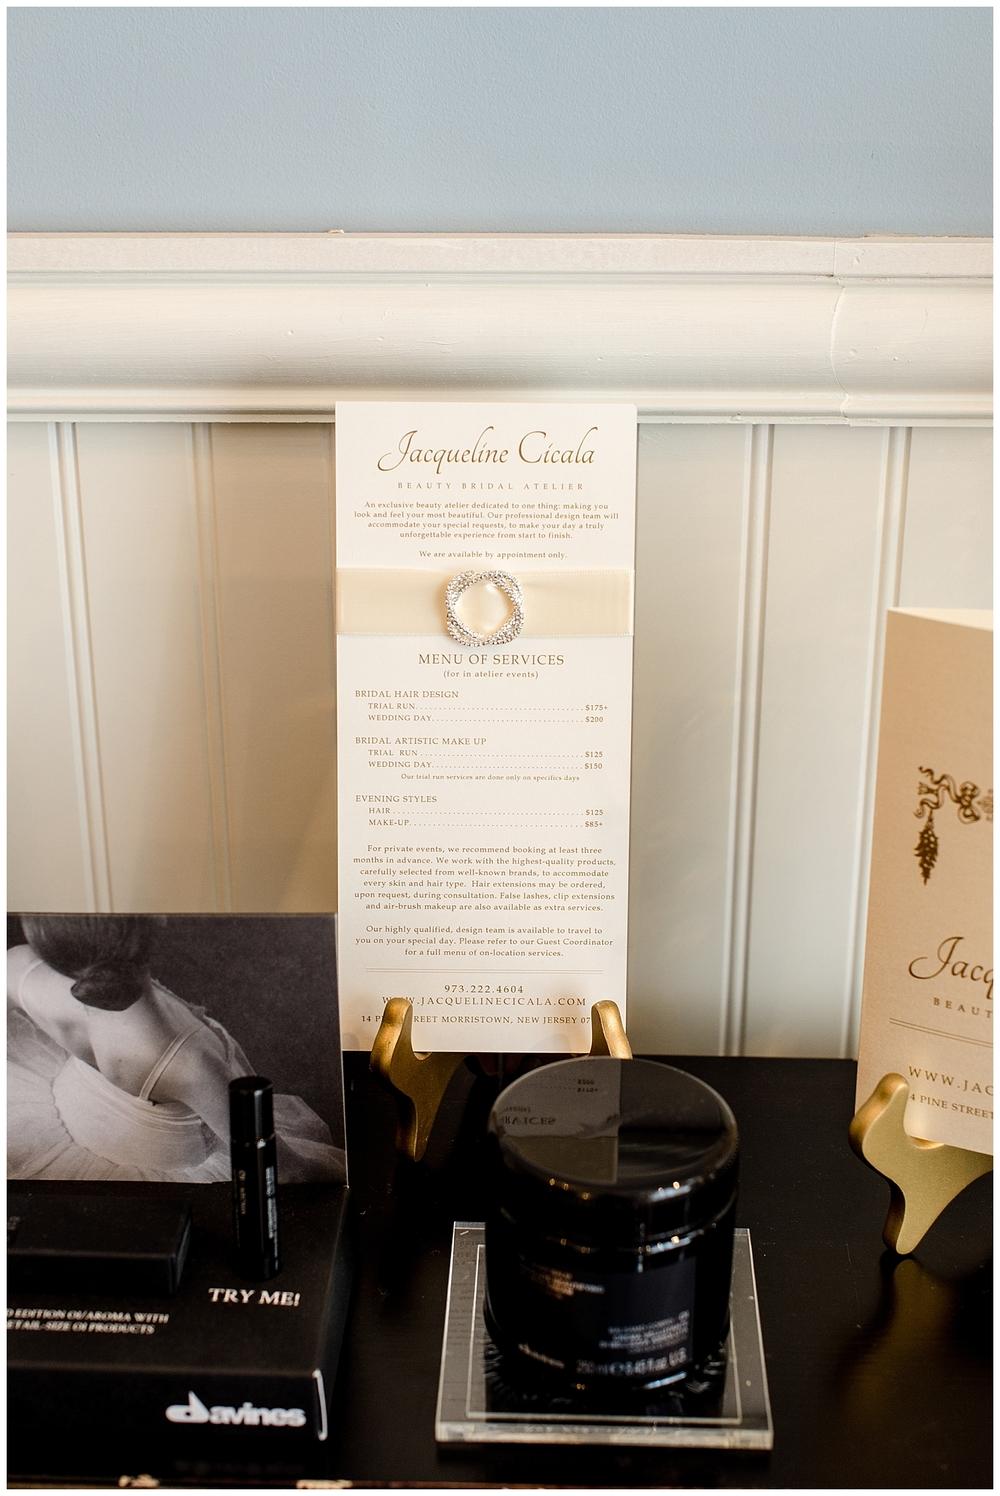 Red Oak Weddings | Jacqueline Cicala Beauty Bridal Atelier | Monika de Myer Photography